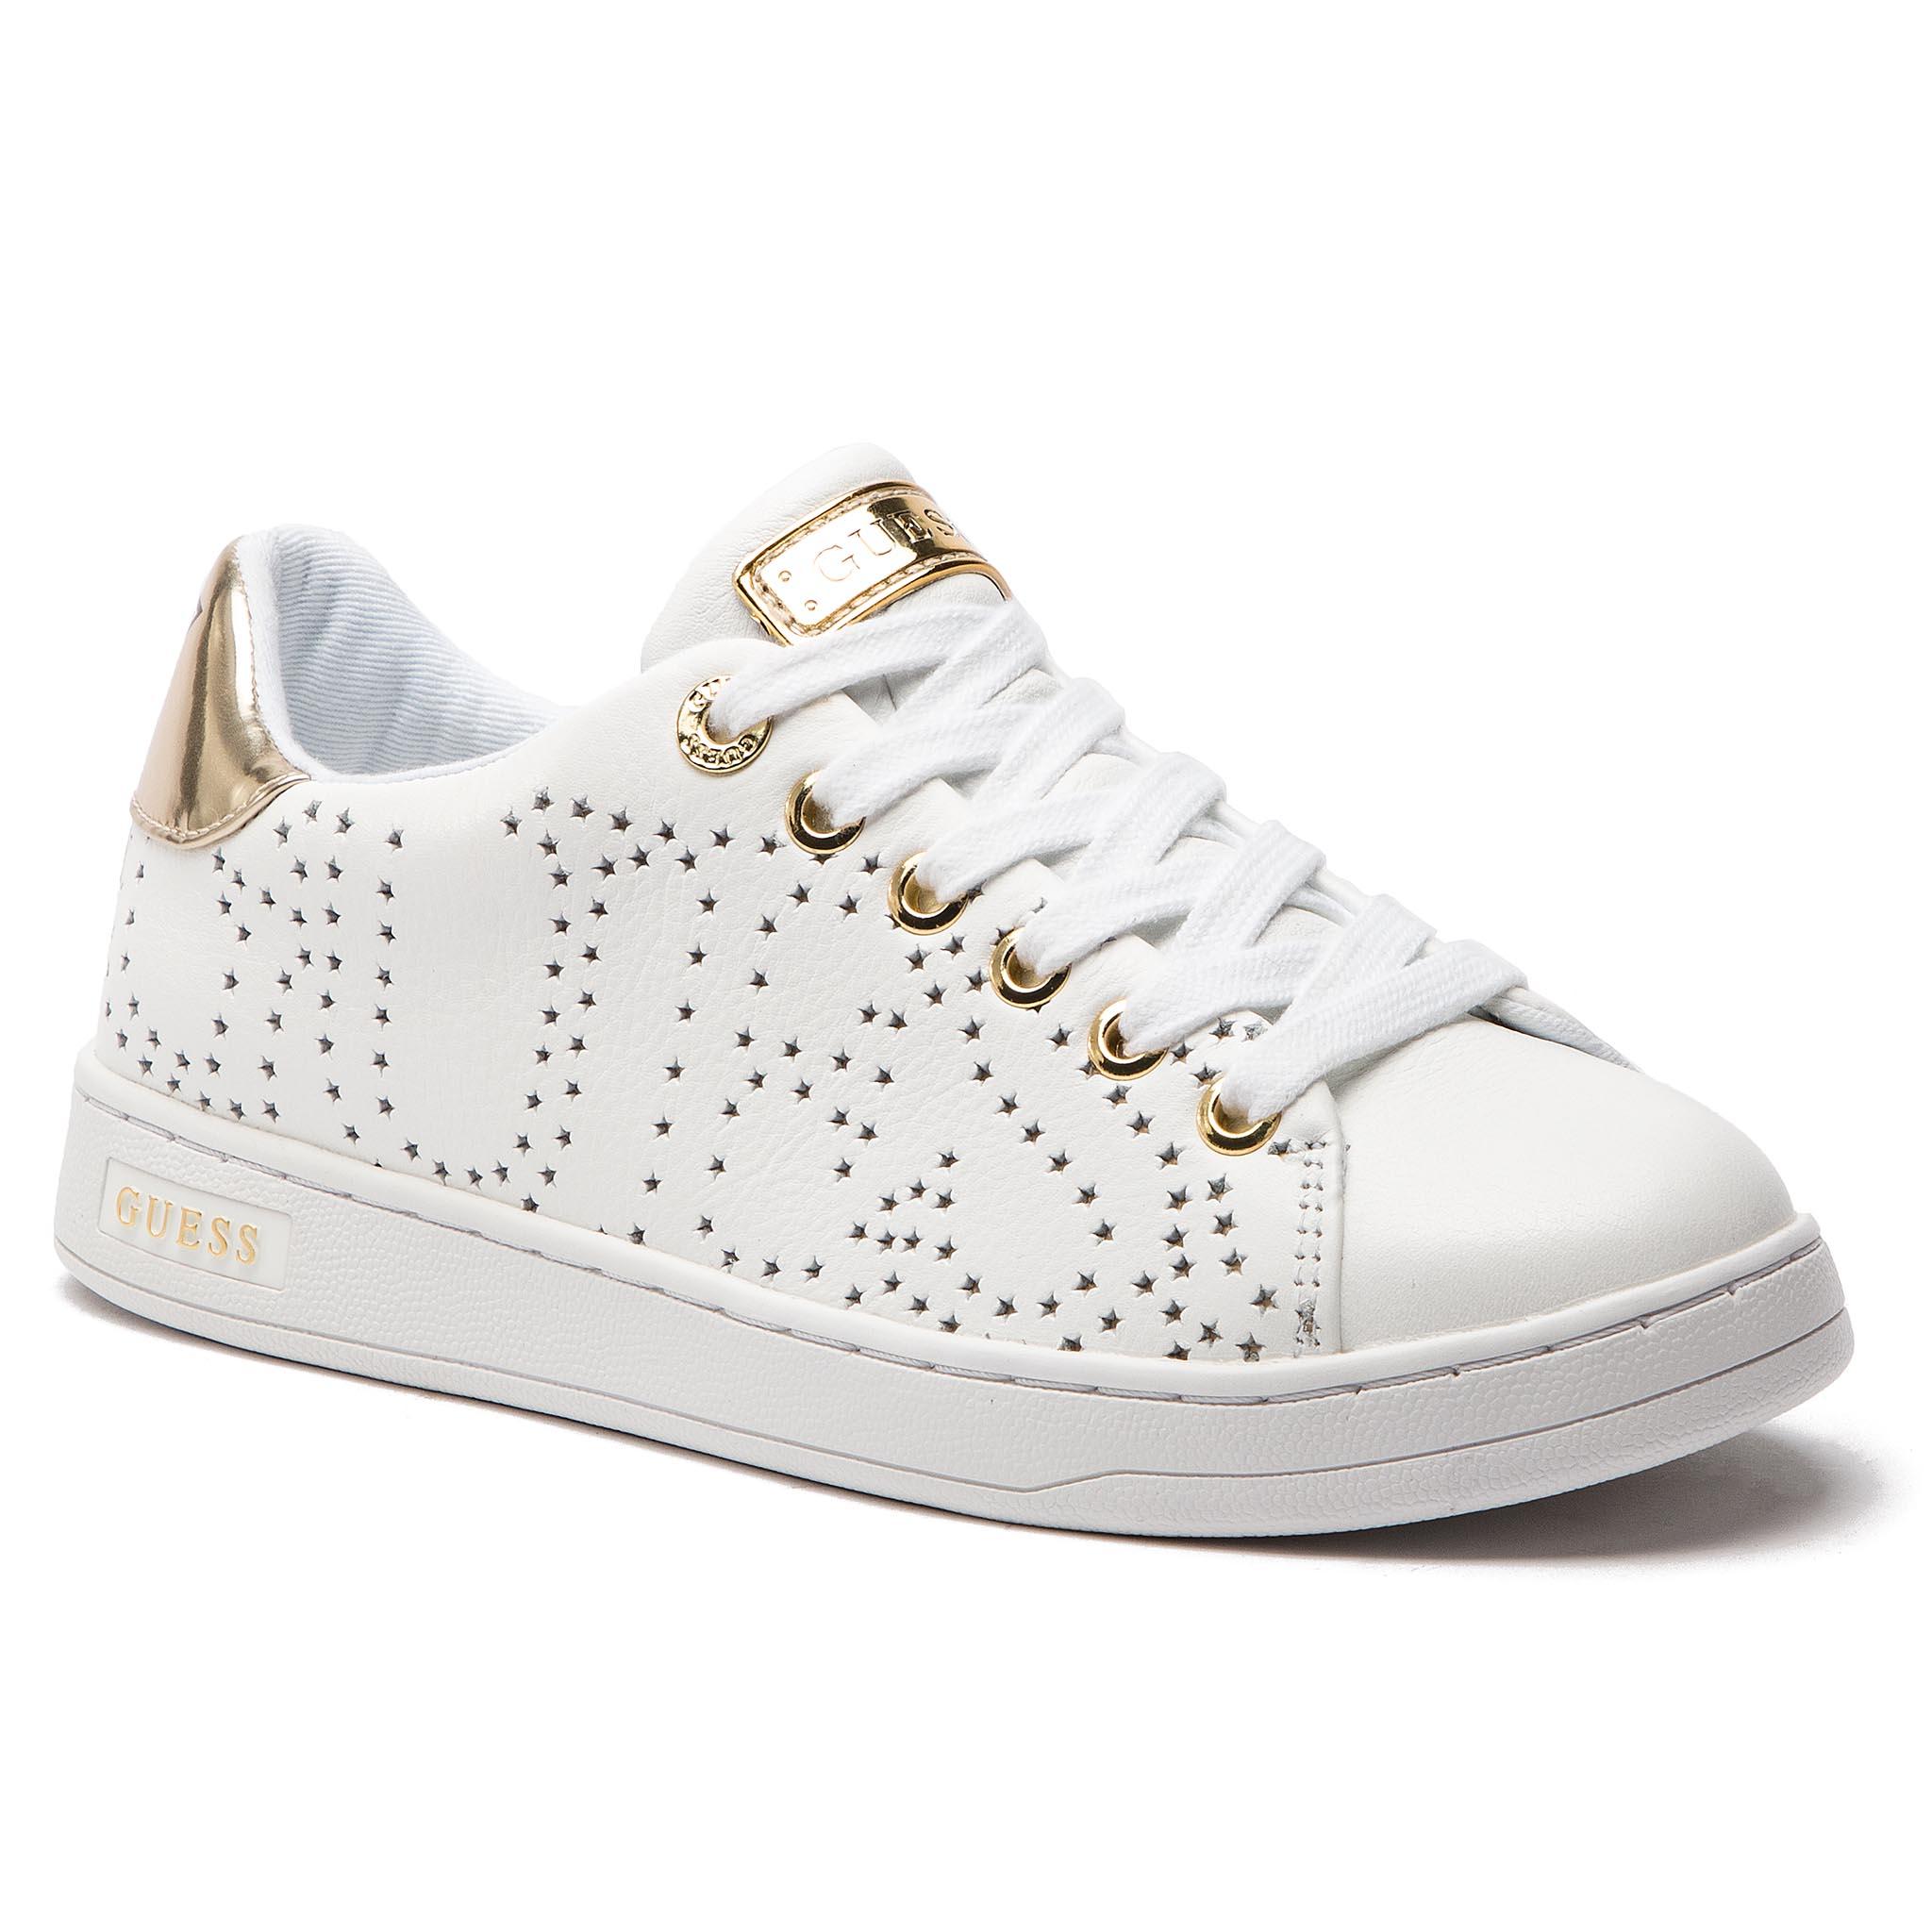 e95b8d0bd0 Sneakers GUESS - Marty FI5MAR PEL12 BLANC/WHITE - Boots - High boots ...